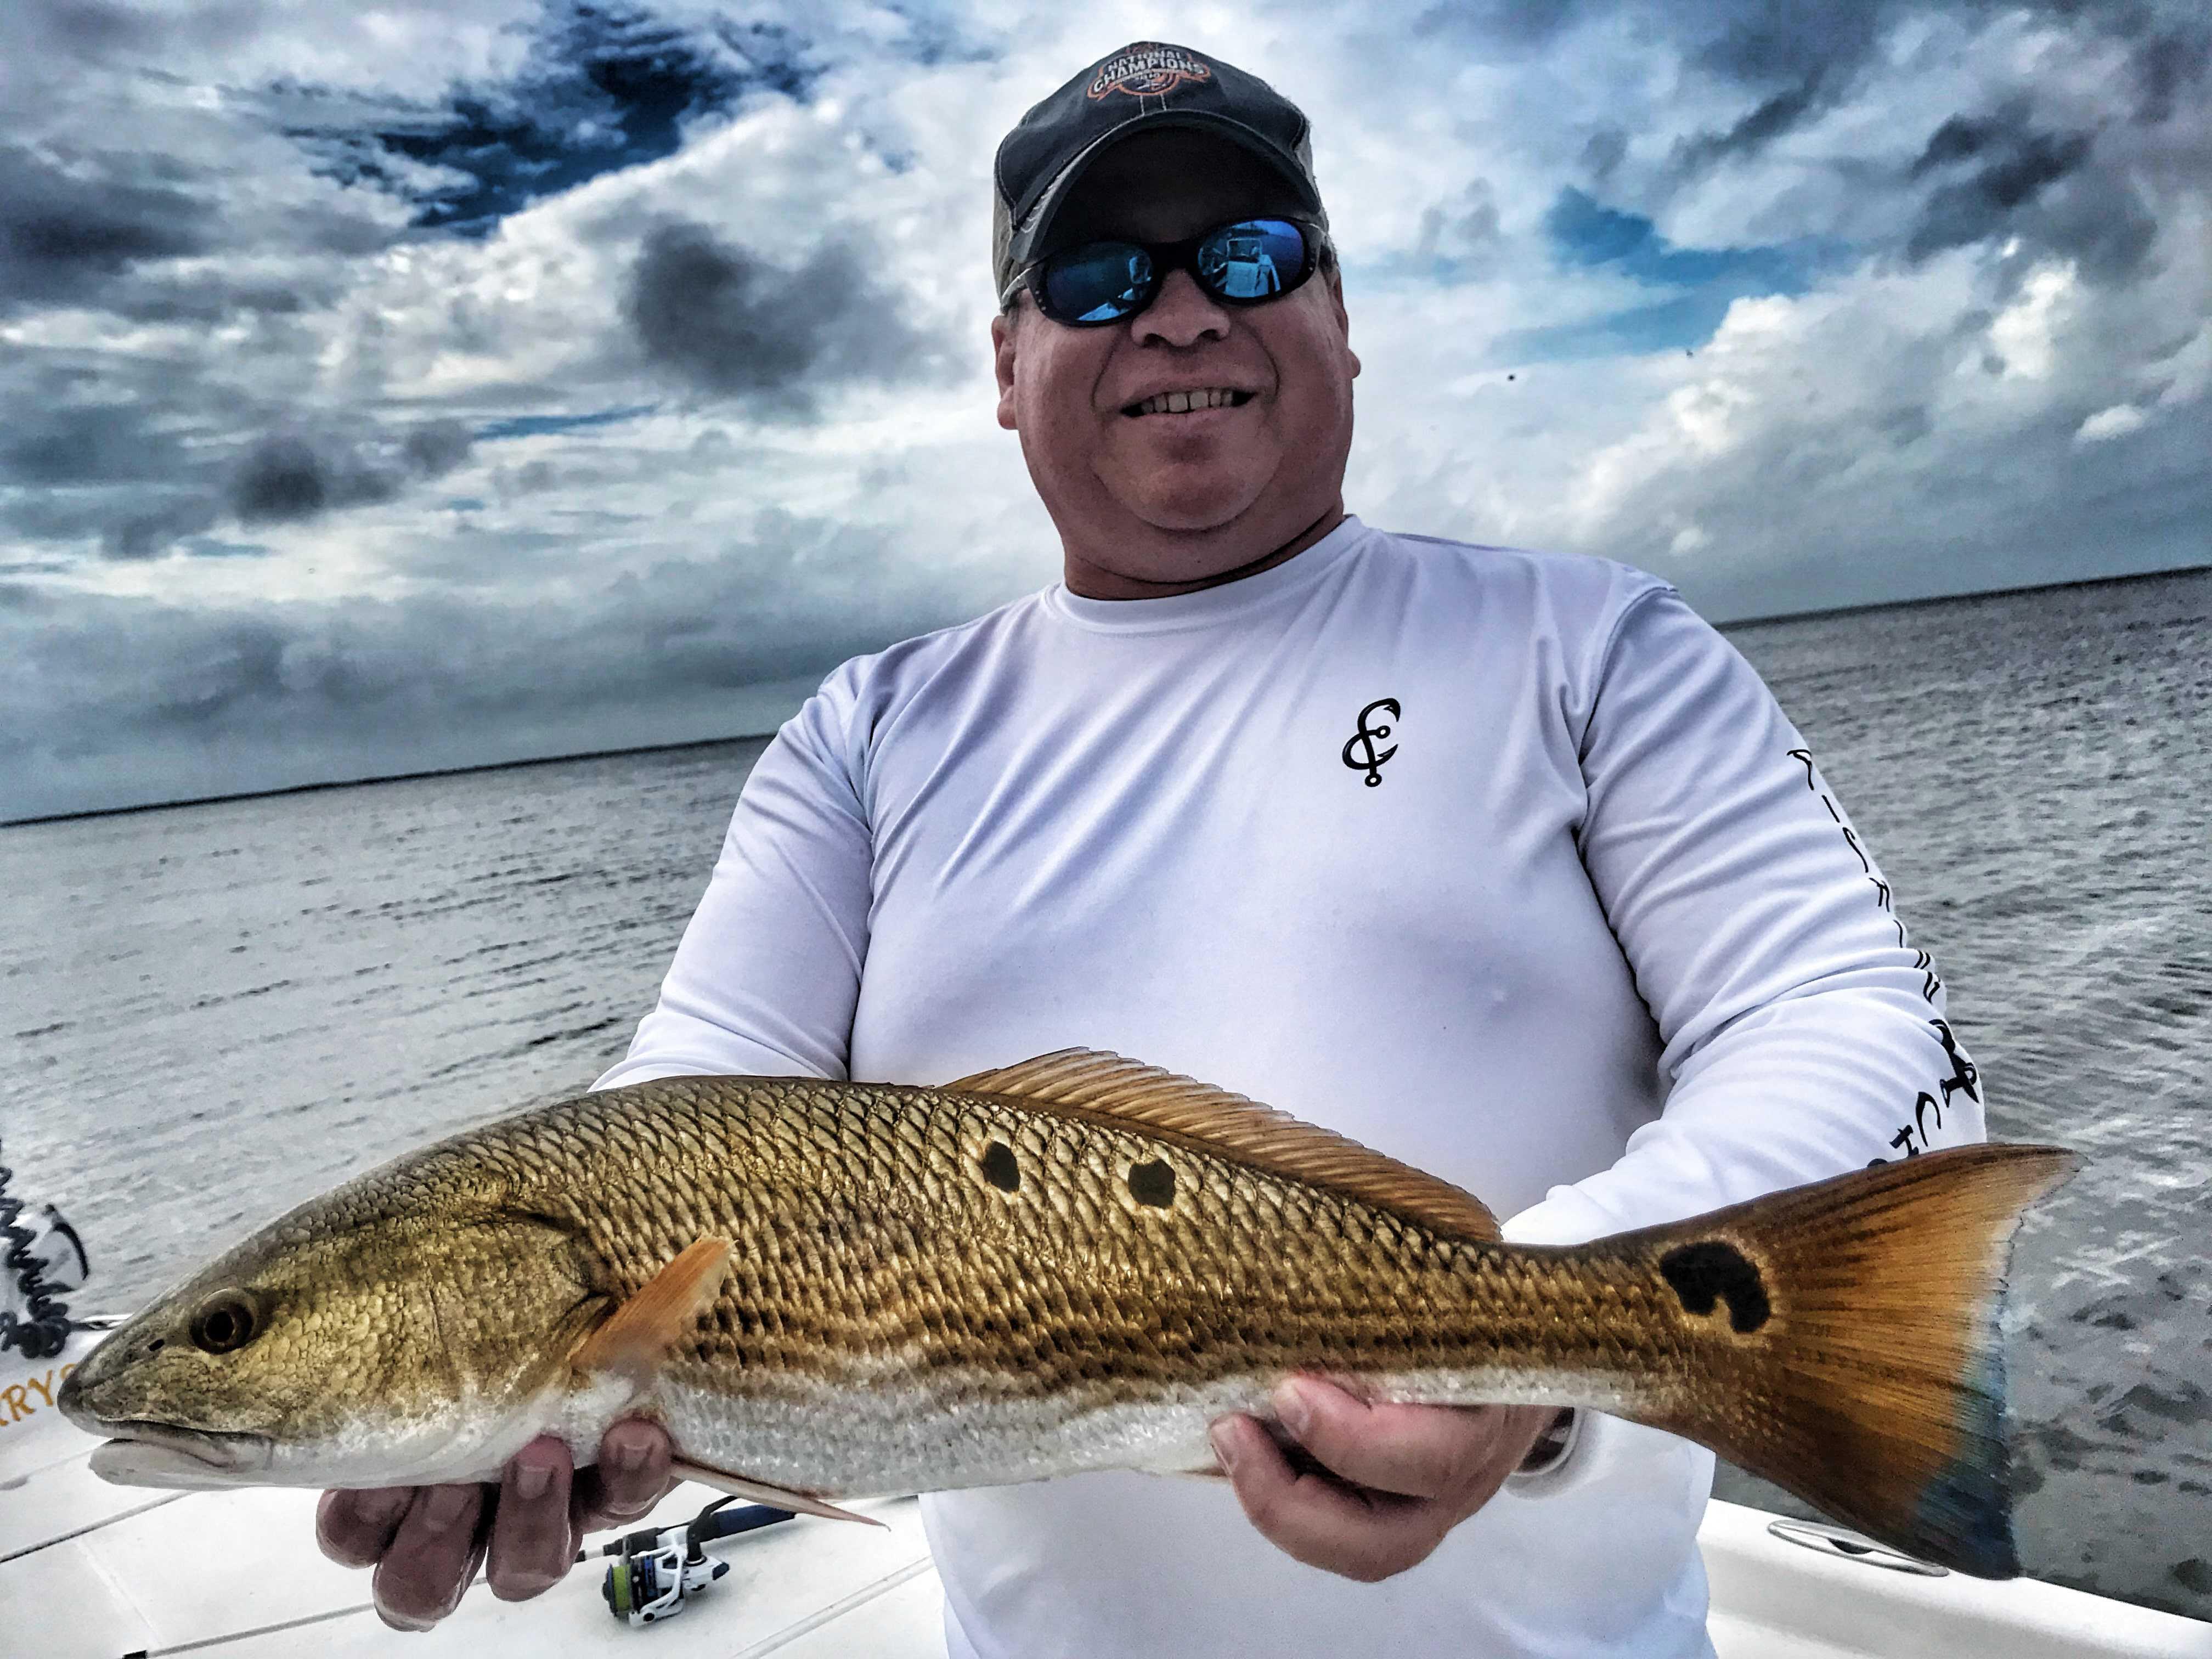 Man-wearing-fishing-chaos-shirt-holding-redfish